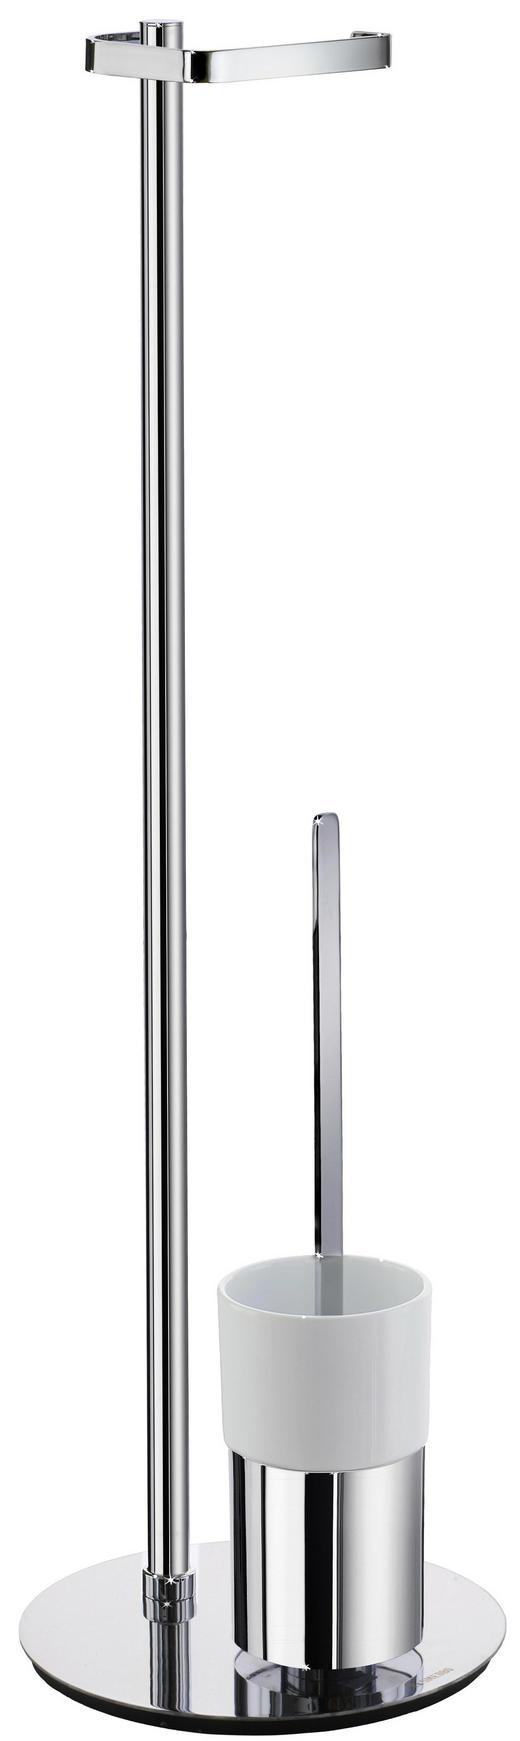 TOILETTENPAPIERHALTER - Chromfarben/Weiß, Basics, Keramik/Metall (23/78cm)